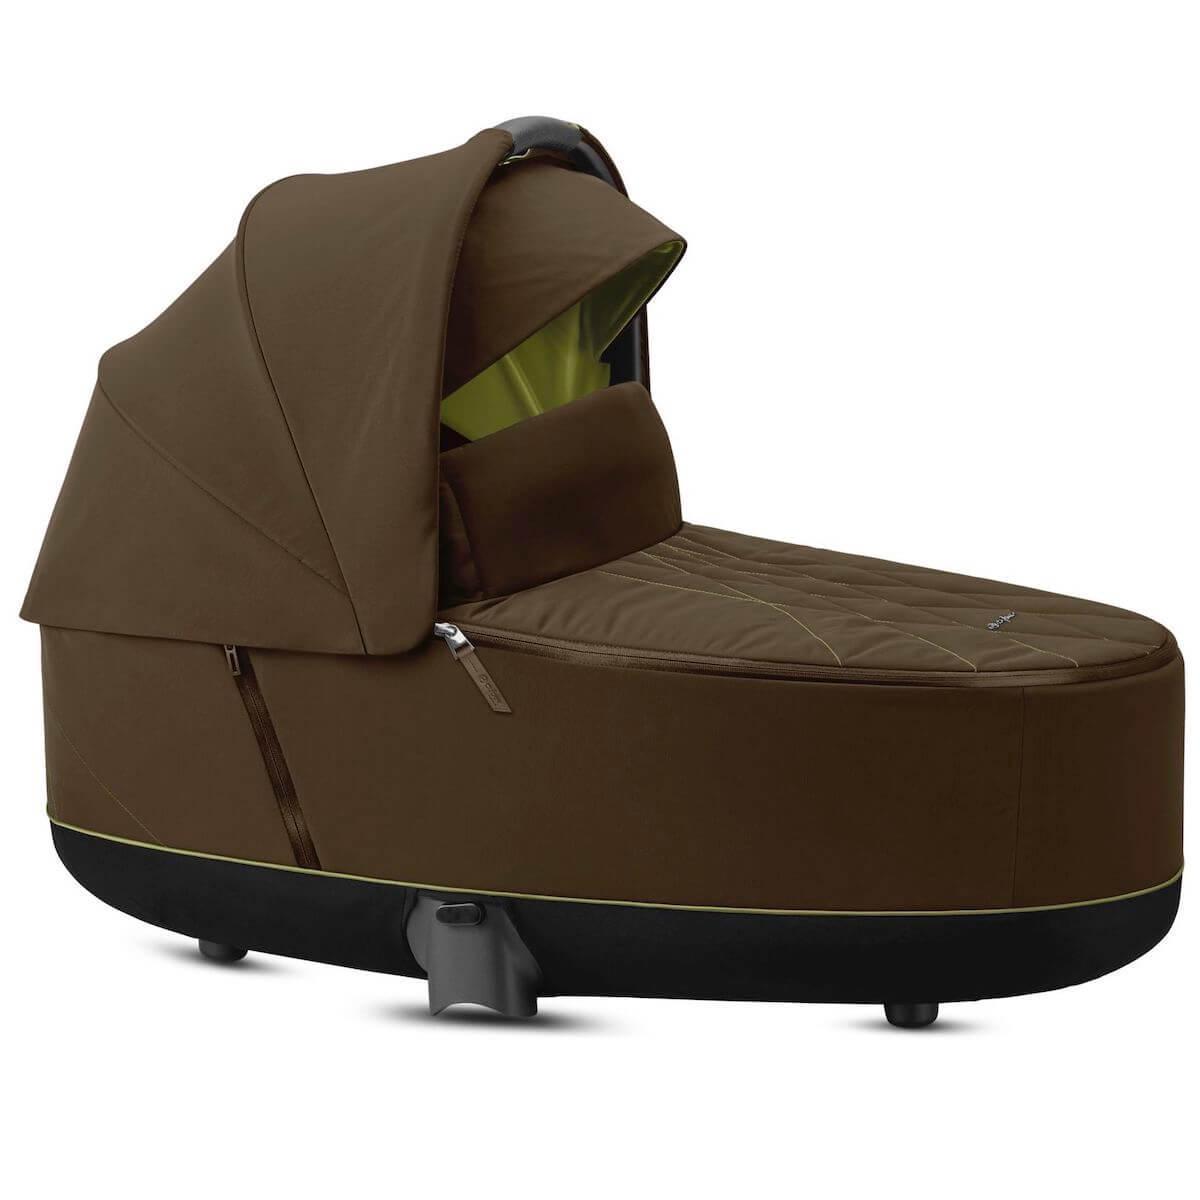 Capazo de luxe PRIAM Cybex Khaki green-khaki brown